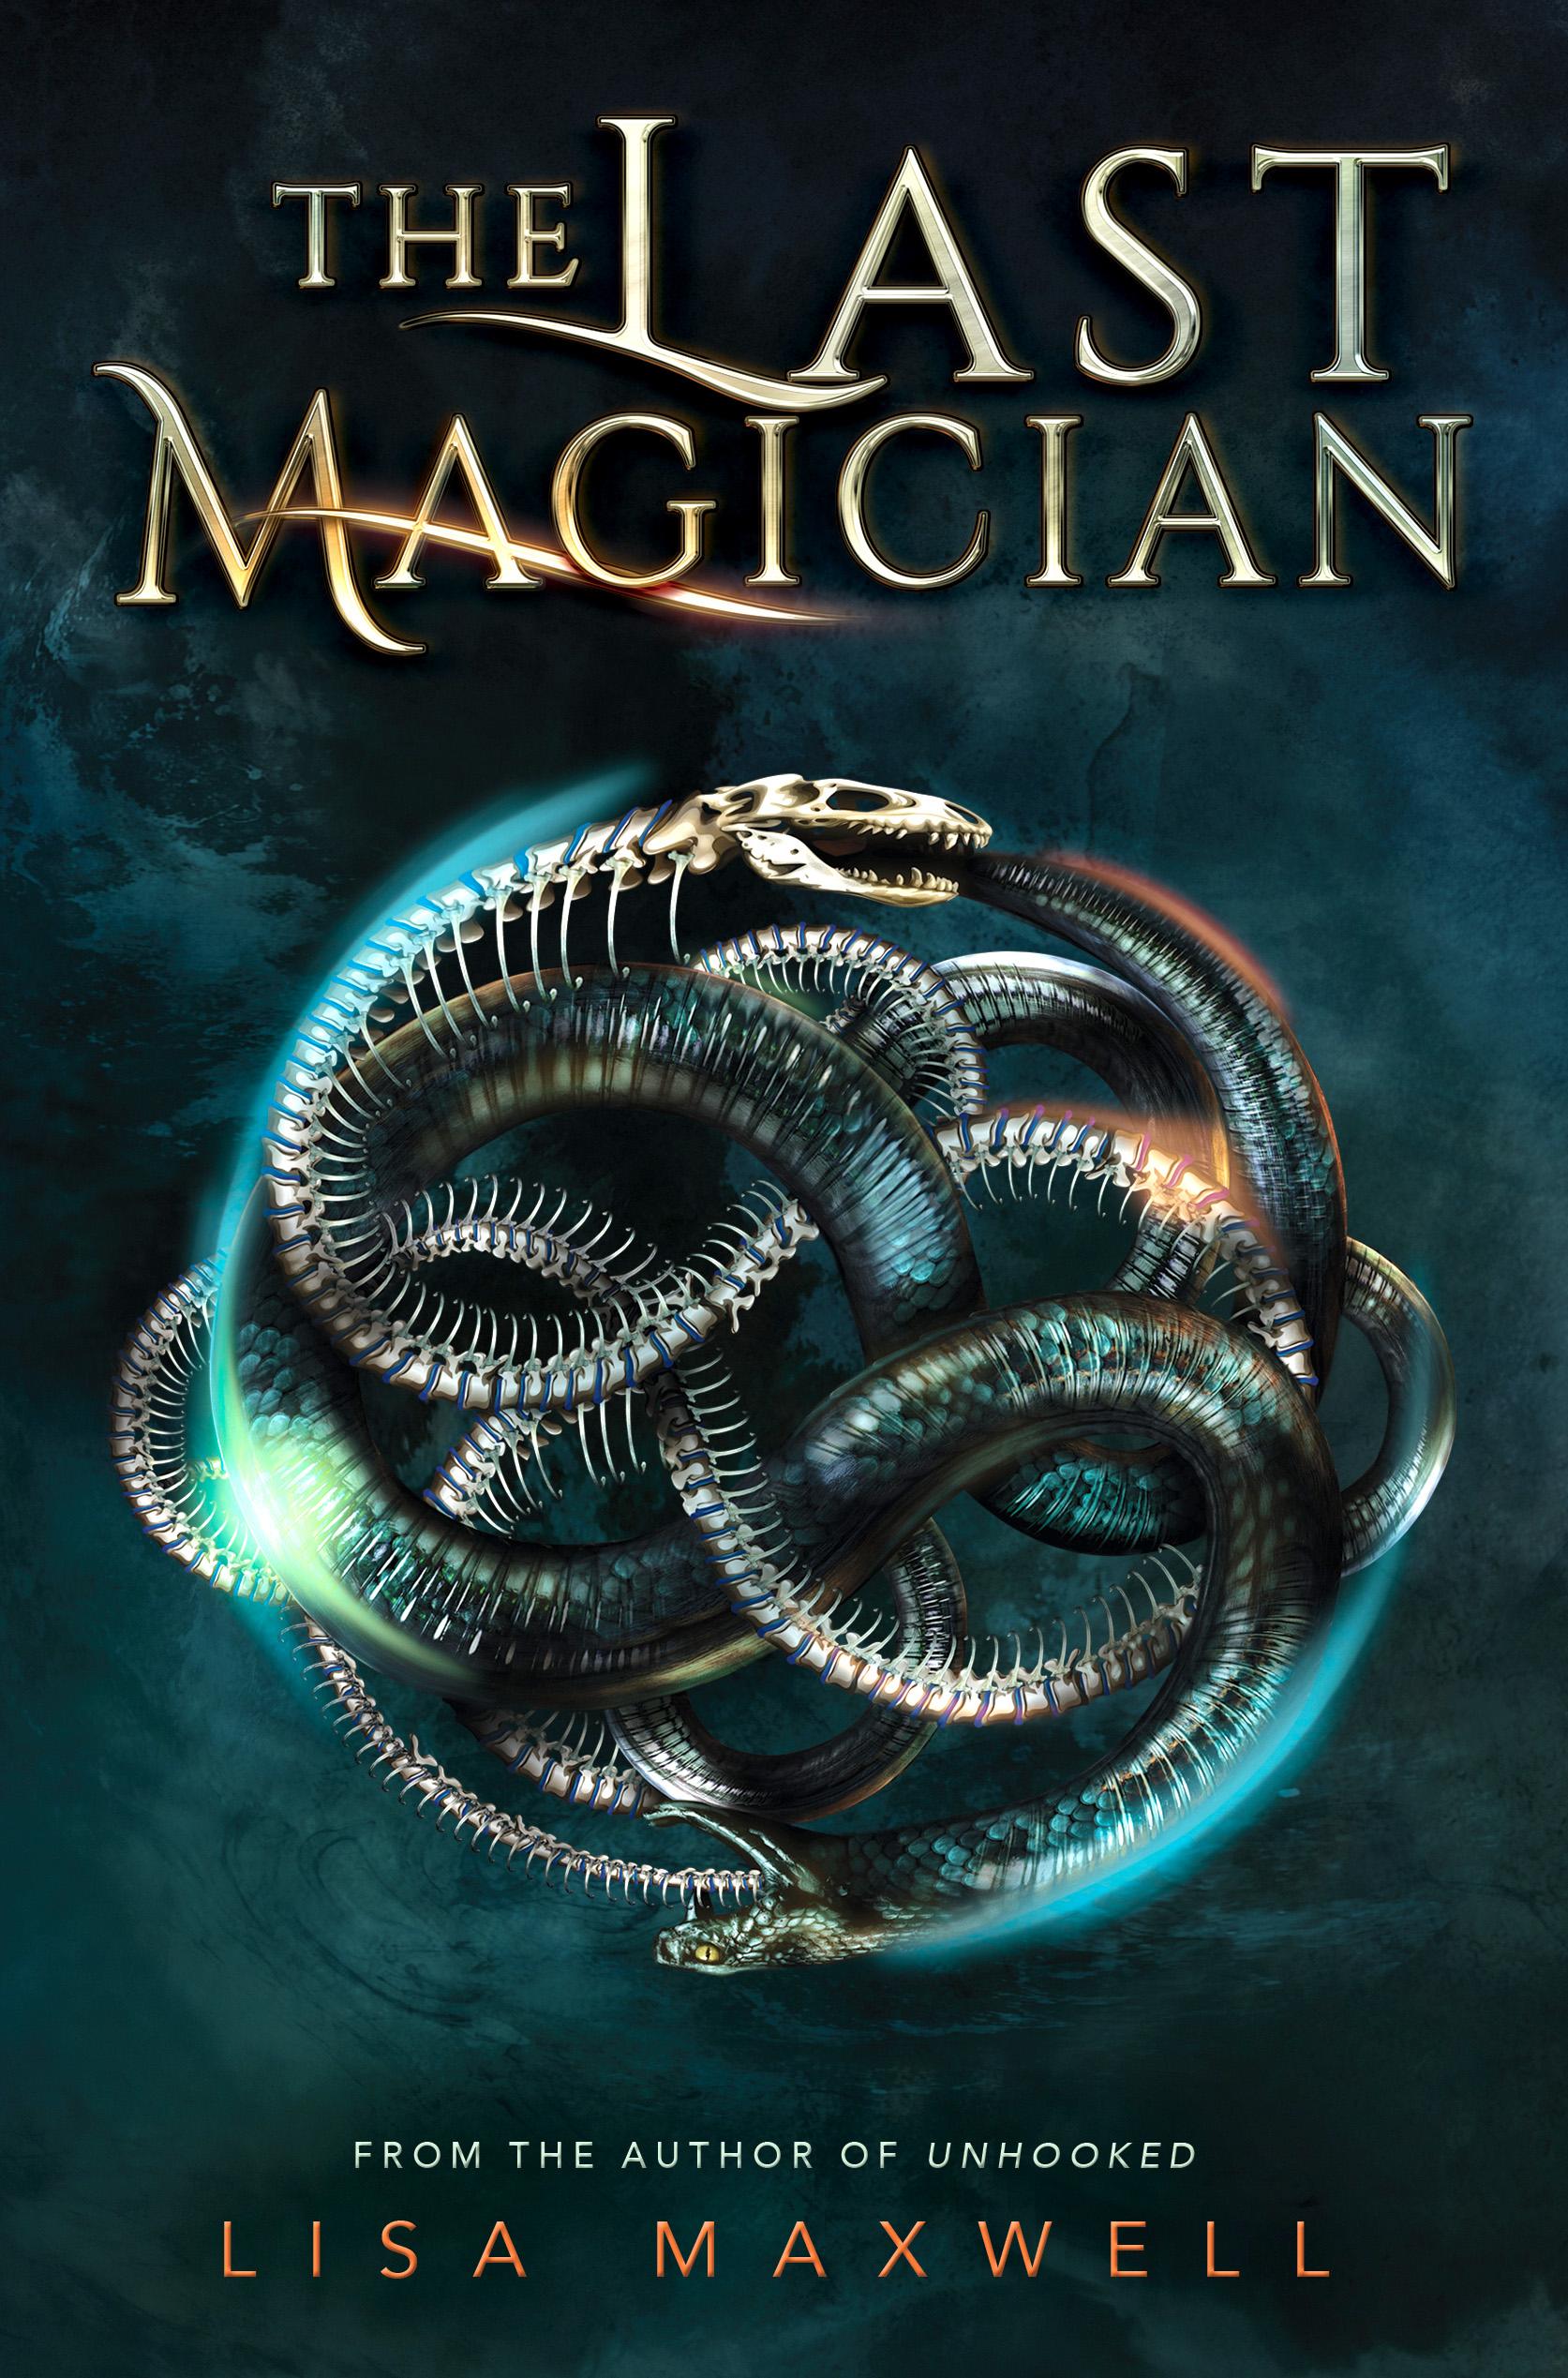 Frontlast magician.jpg